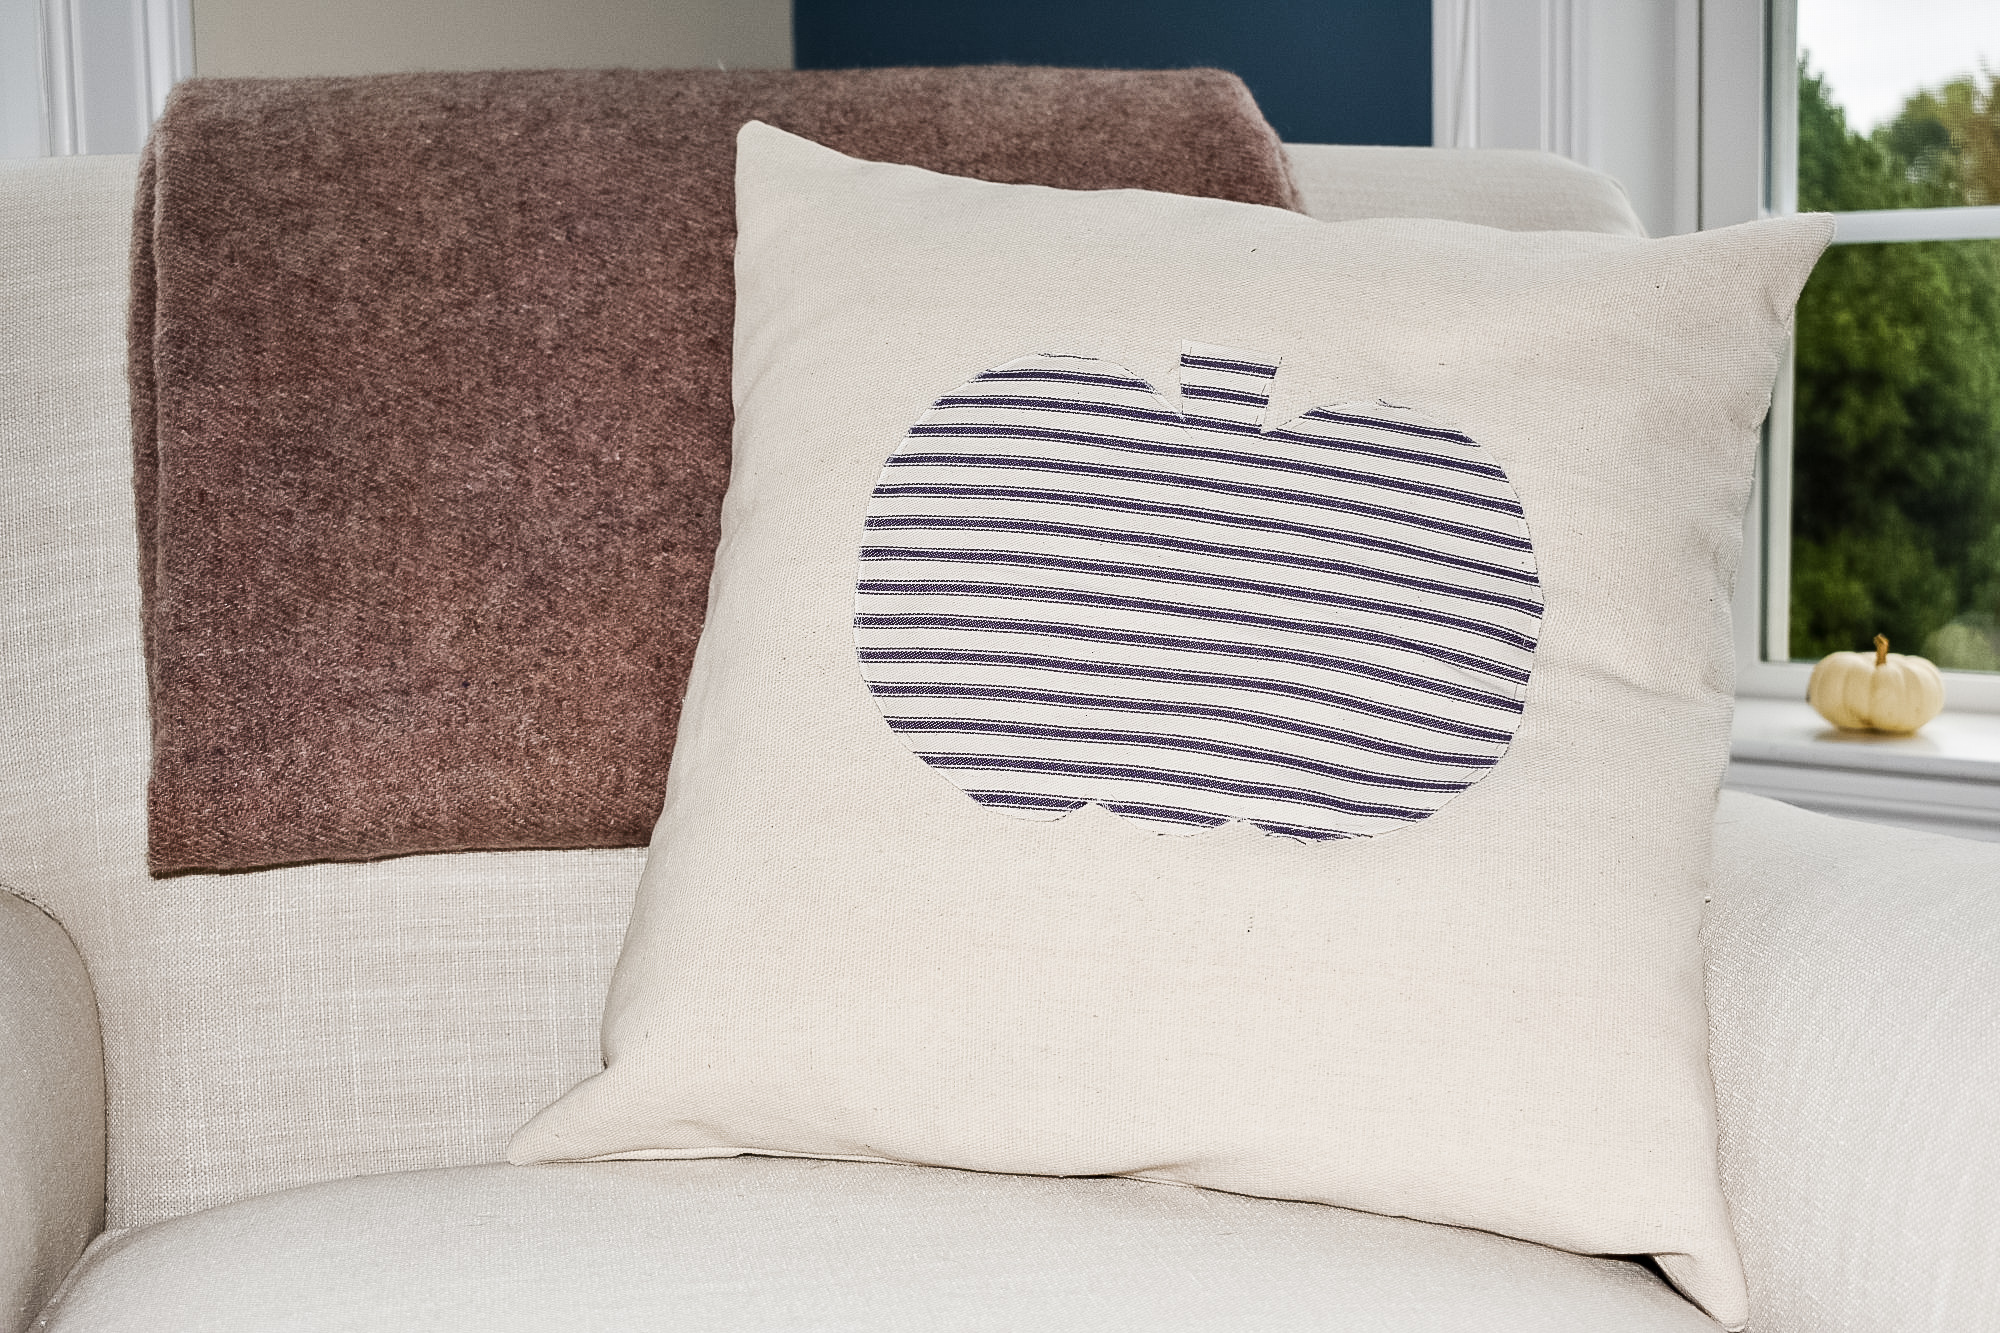 Neutral fall pumpkin pillow made of drop cloth and ticking stripe